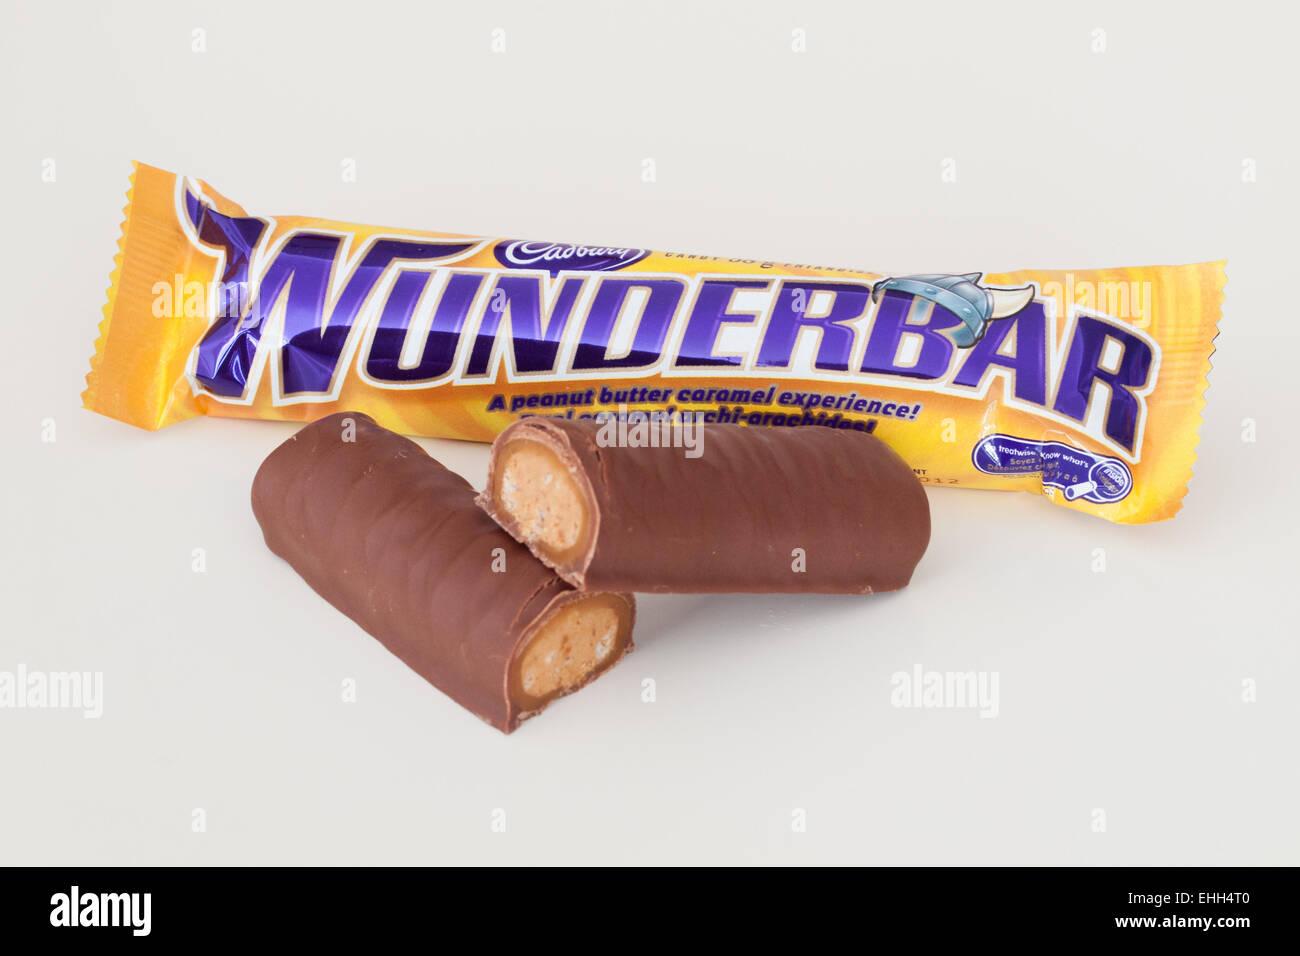 Chocolate Bar Uk